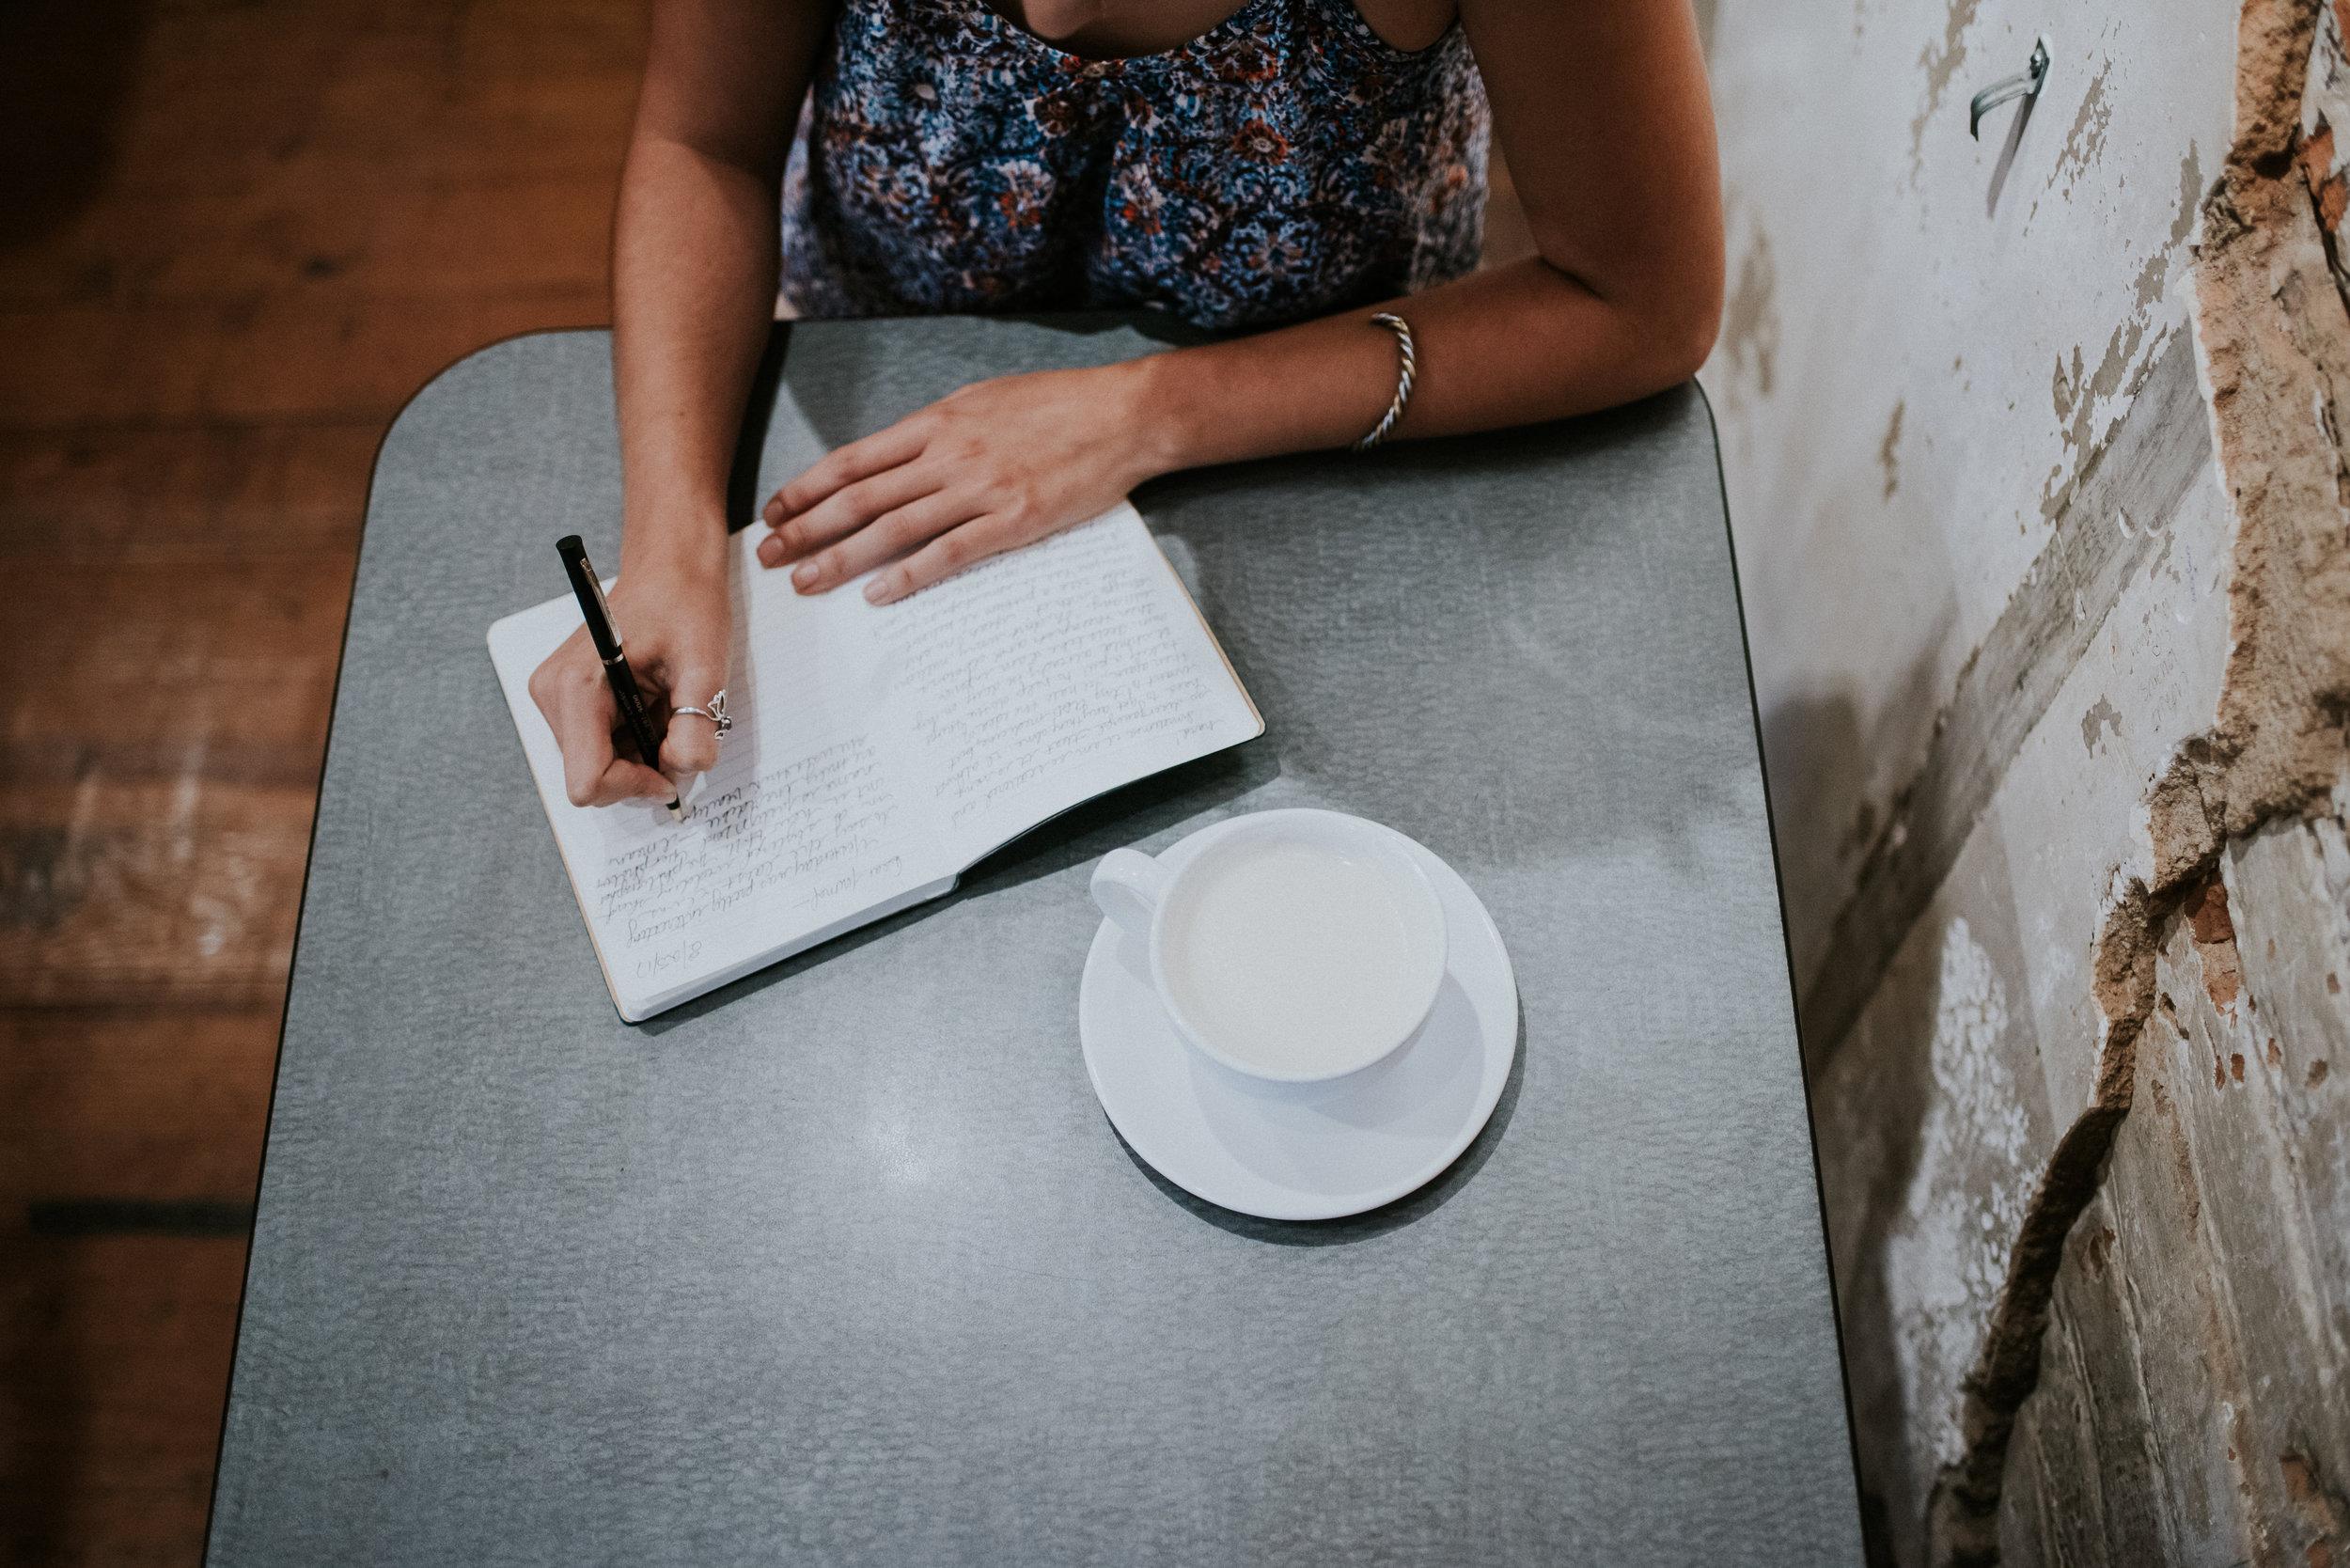 Cheyenne writes in her journal